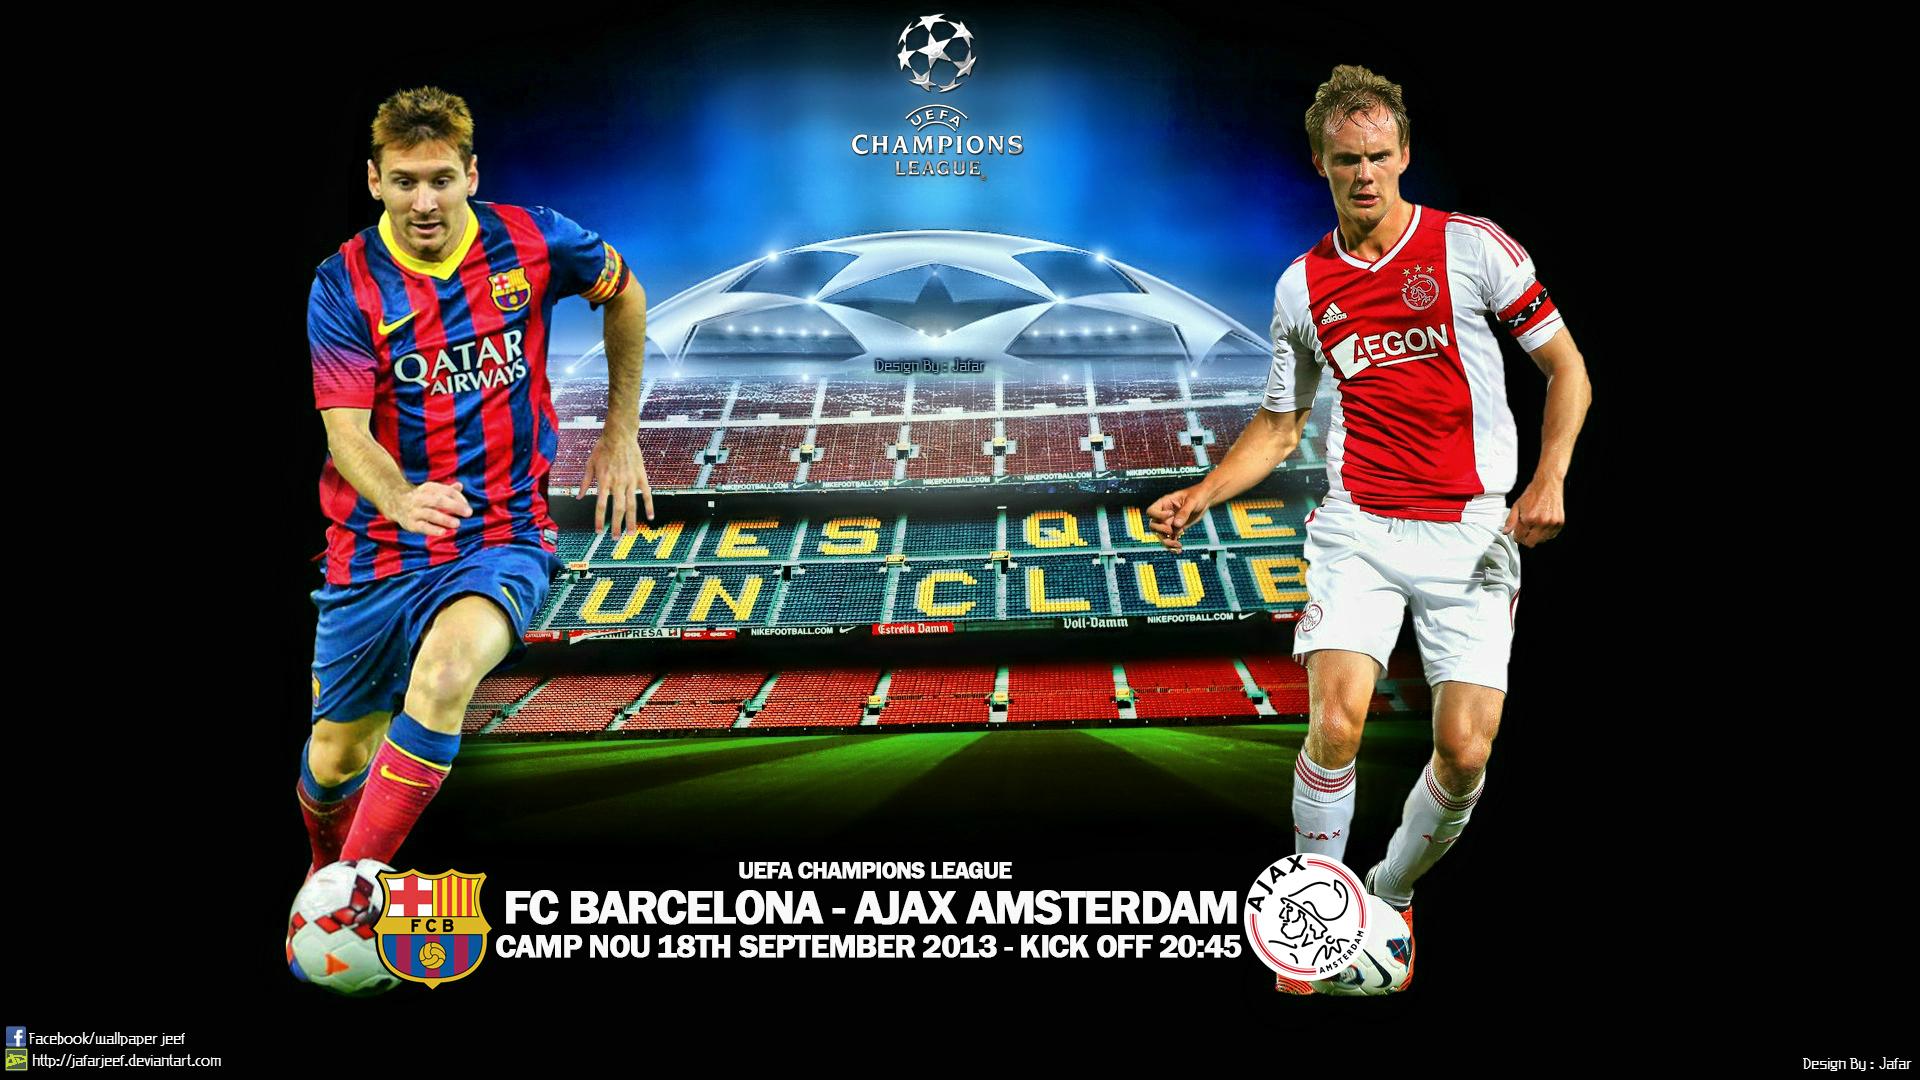 FC Barcelona Champions League Wallpaper WallpaperSafari